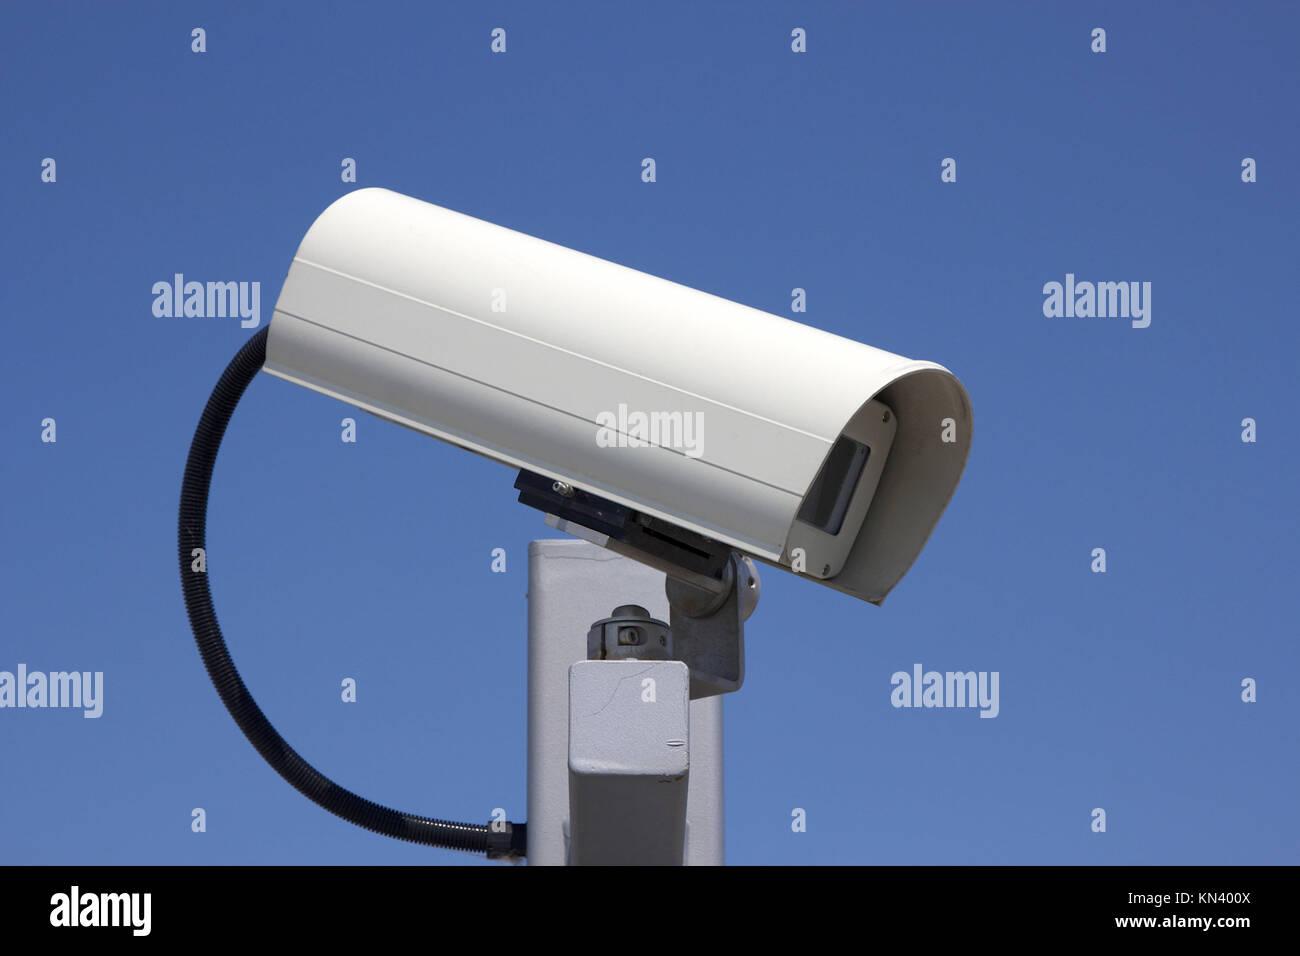 Close-up of modern outdoor surveillance camera facing right. - Stock Image